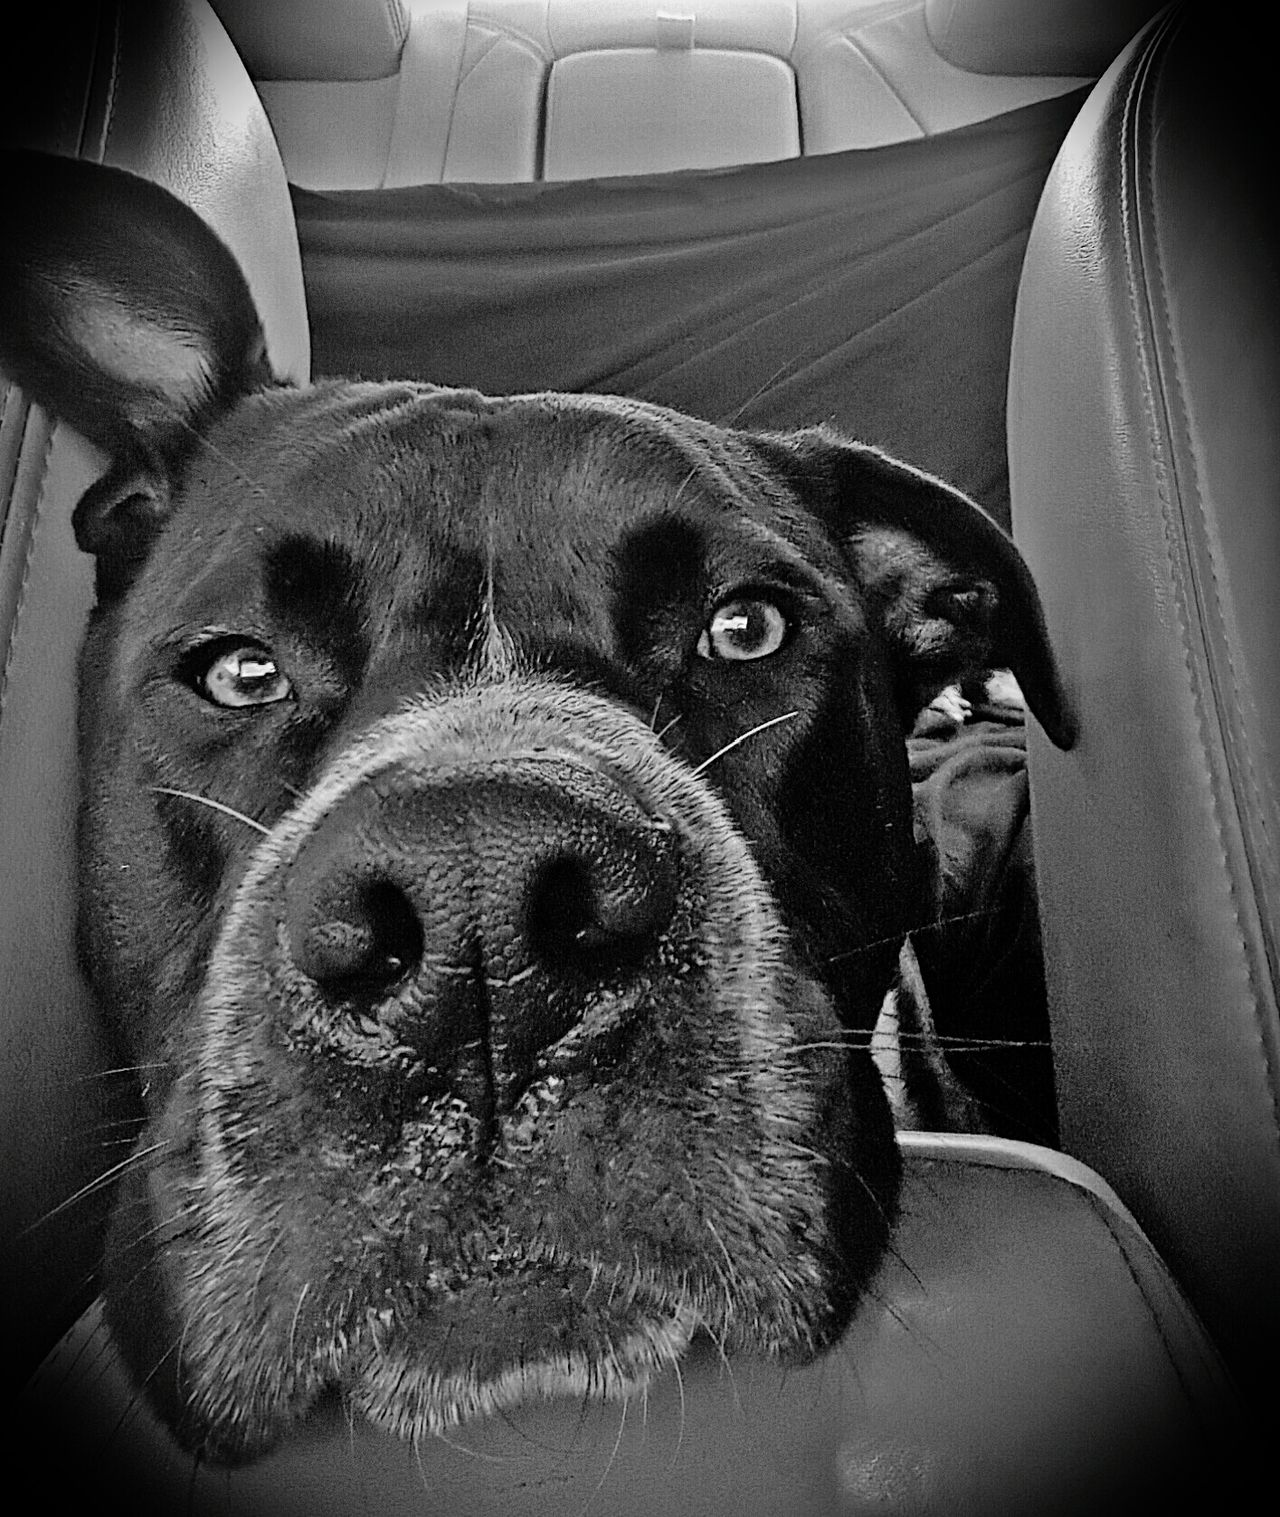 Animal Themes Mammal Pets Domestic Animals One Animal Close-up Dog No People Indoors  Portrait Day Maximum Closeness Pitbull Love PitBullNation Pitbull Lives Matter